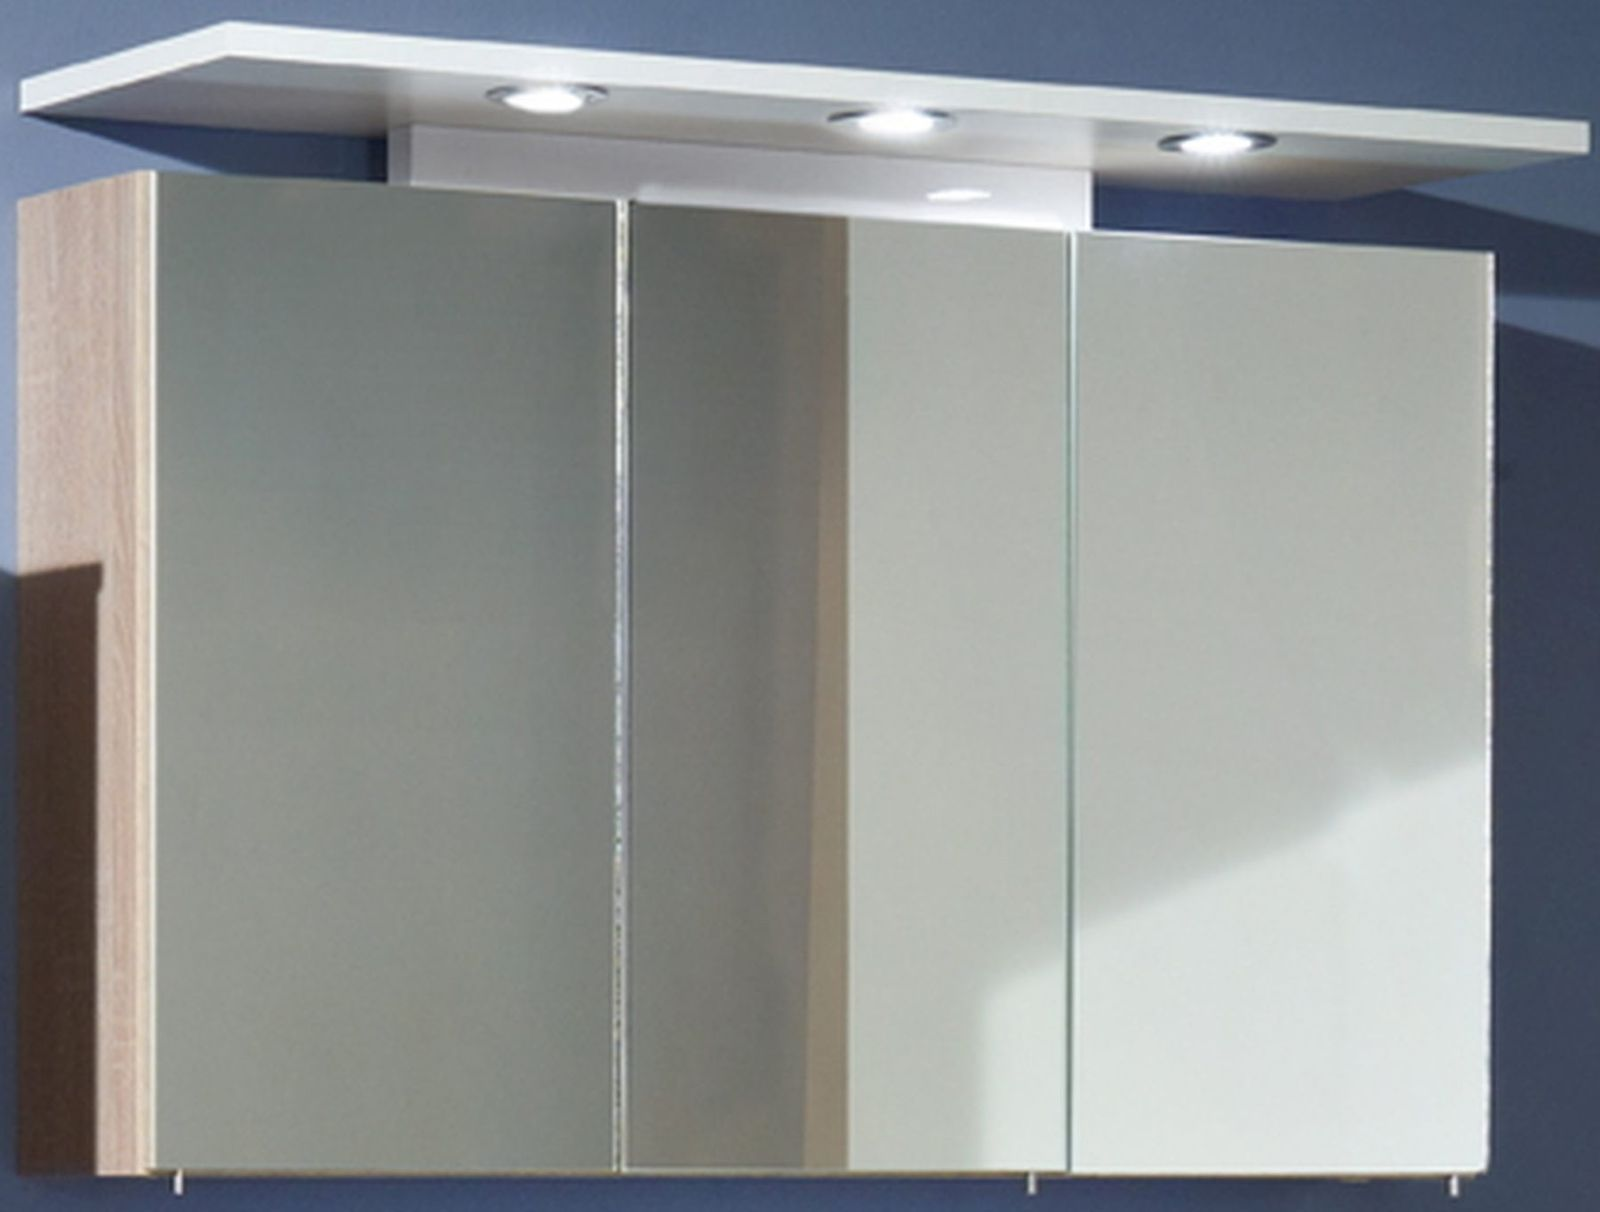 2 tlg badset led spiegelschrank g ste bad wc waschplatz 100 cm badm bel zl83200 kaufen bei. Black Bedroom Furniture Sets. Home Design Ideas